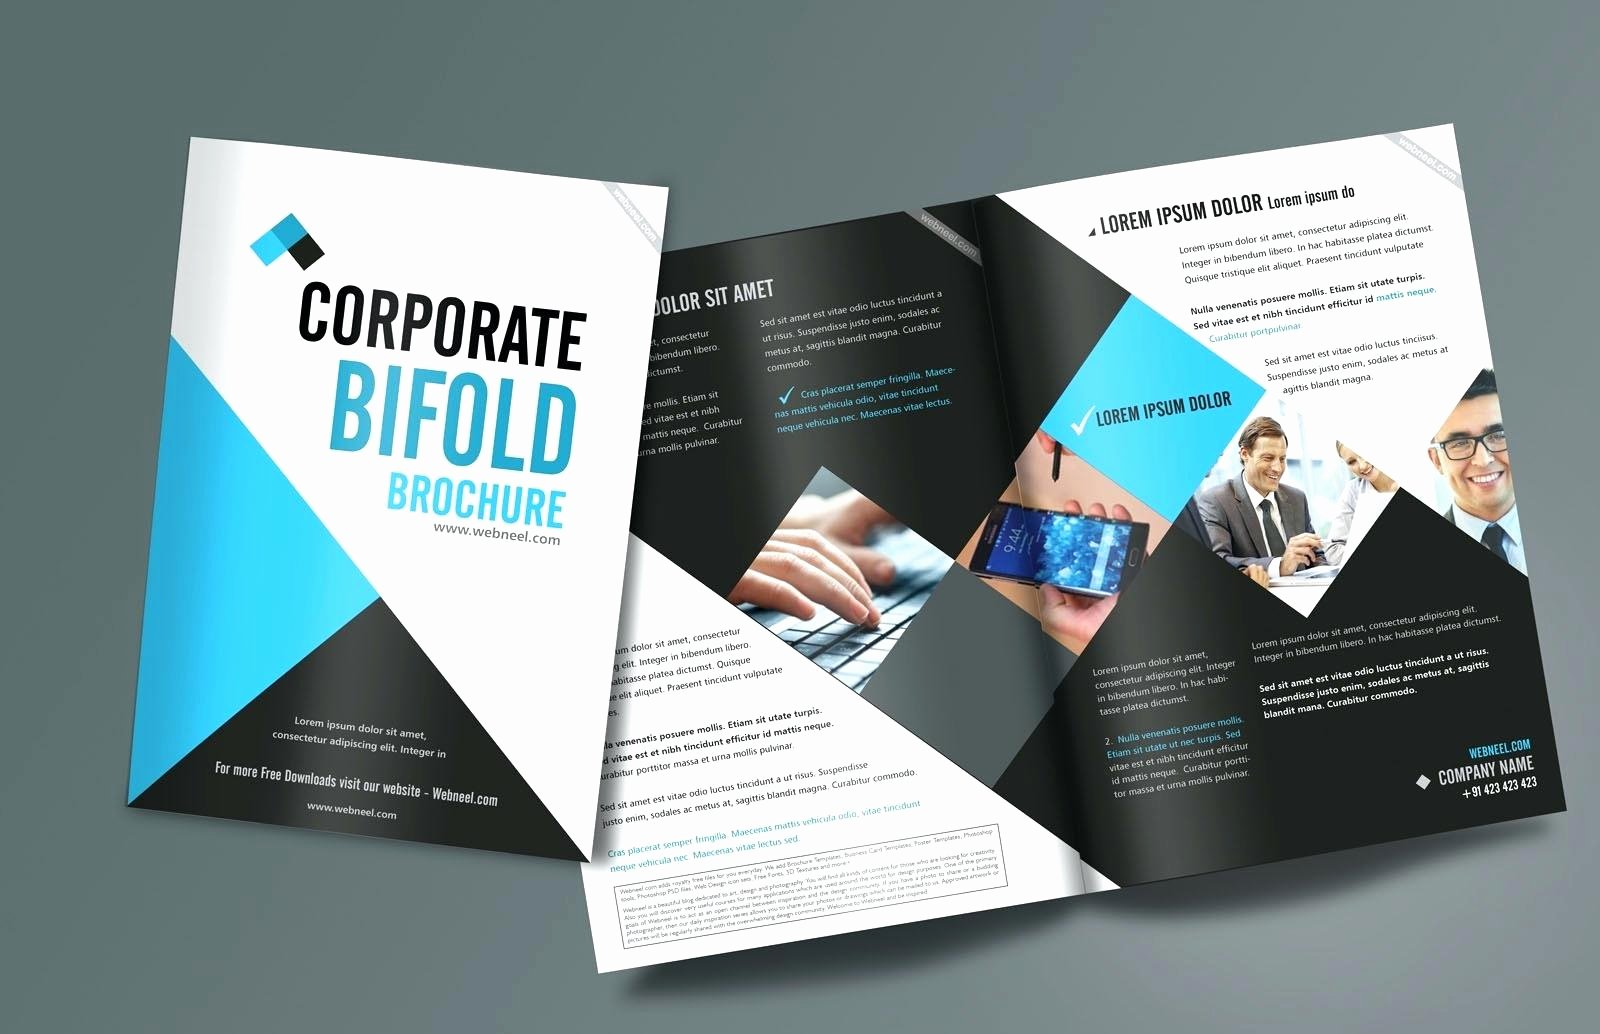 2 Fold Brochure Template Elegant 3 Fold Brochure Template Indesign